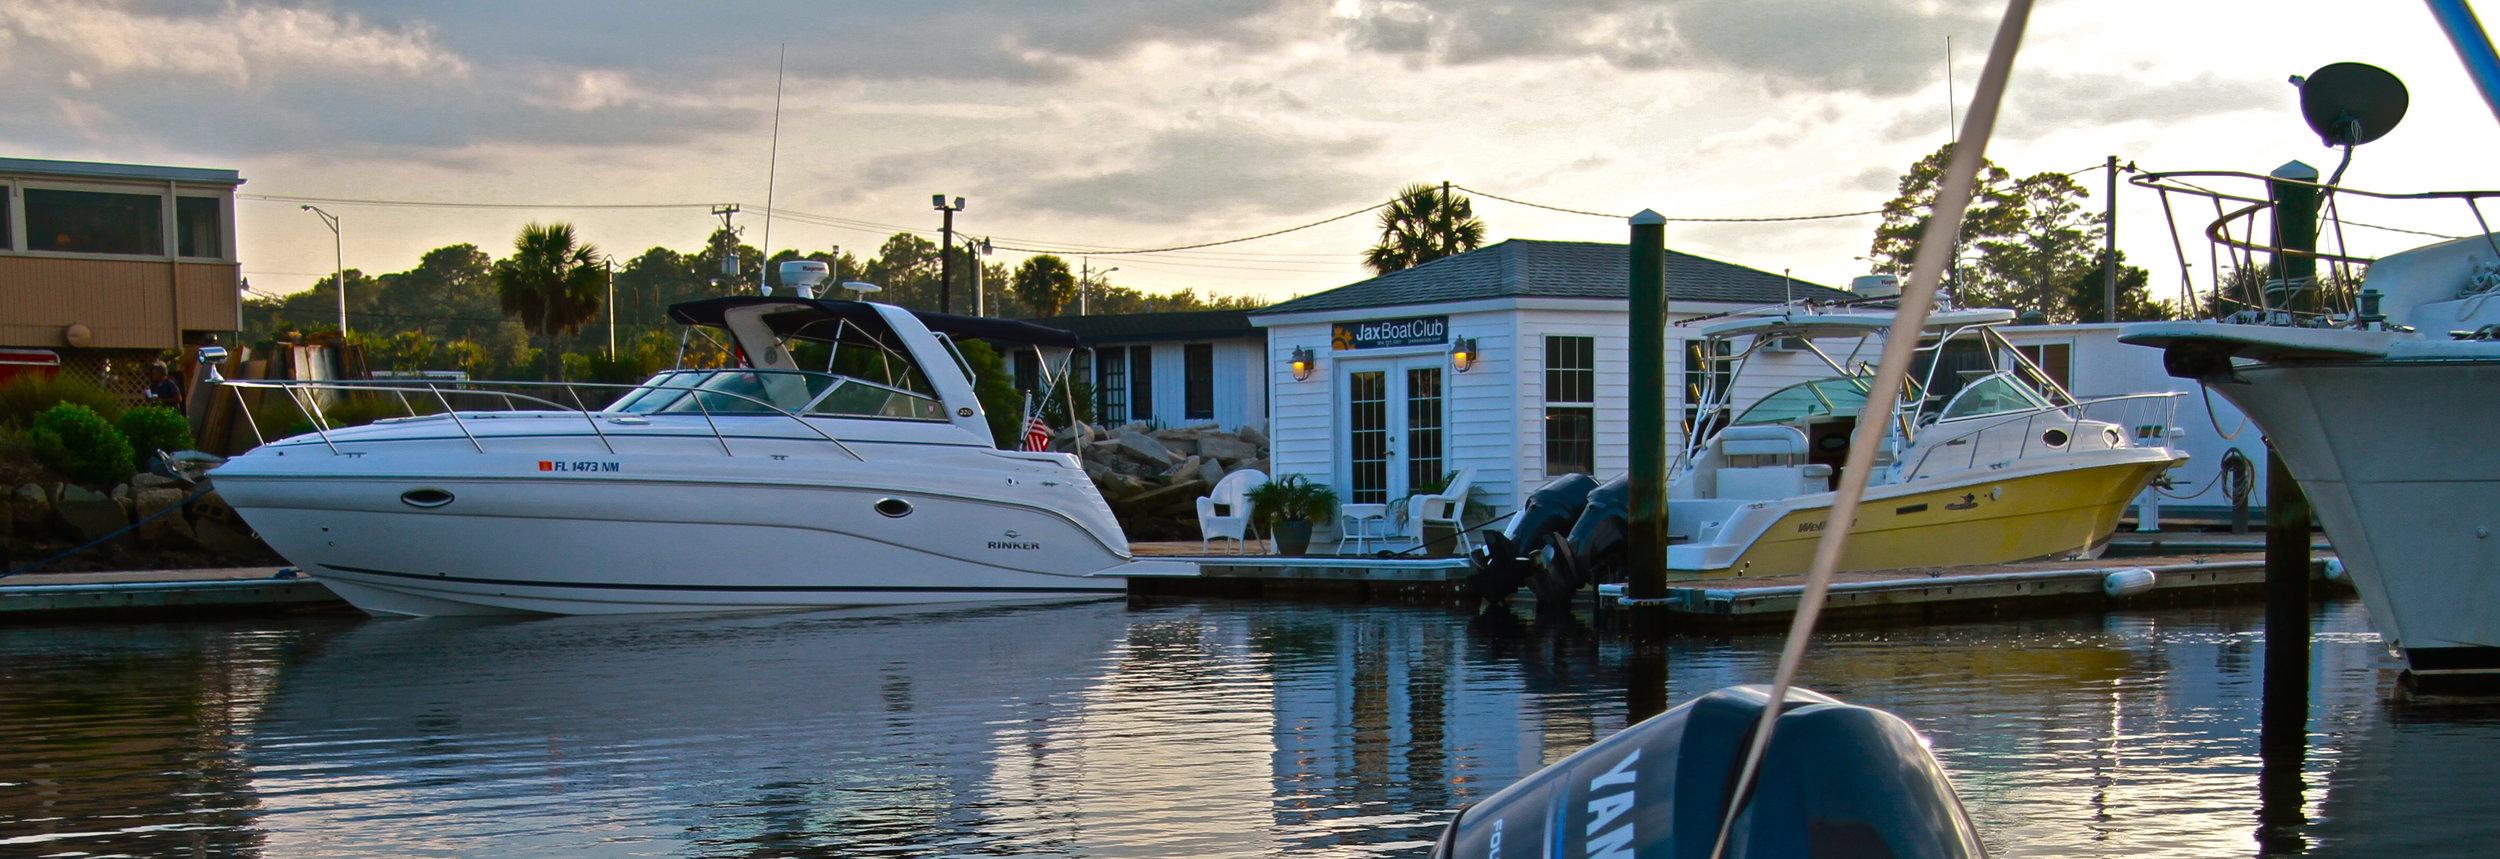 Jax Boat Club Front Office